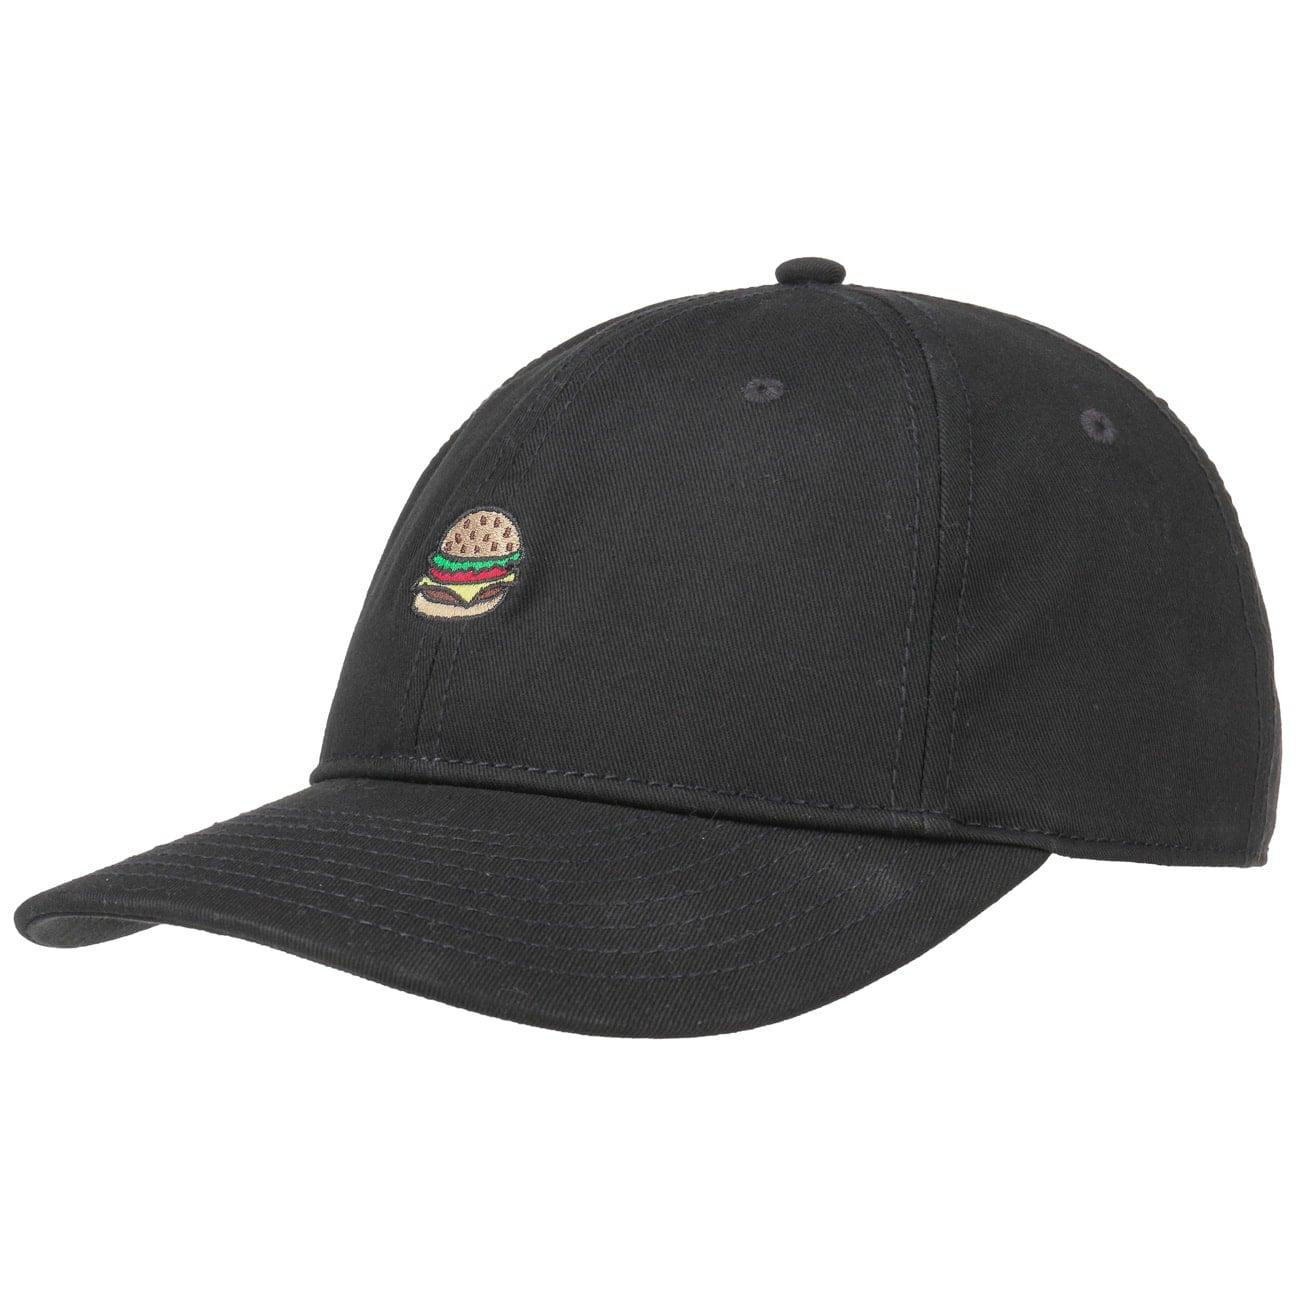 Gorra Patty Dad Hat Strapback by WEMOTO  gorra de baseball